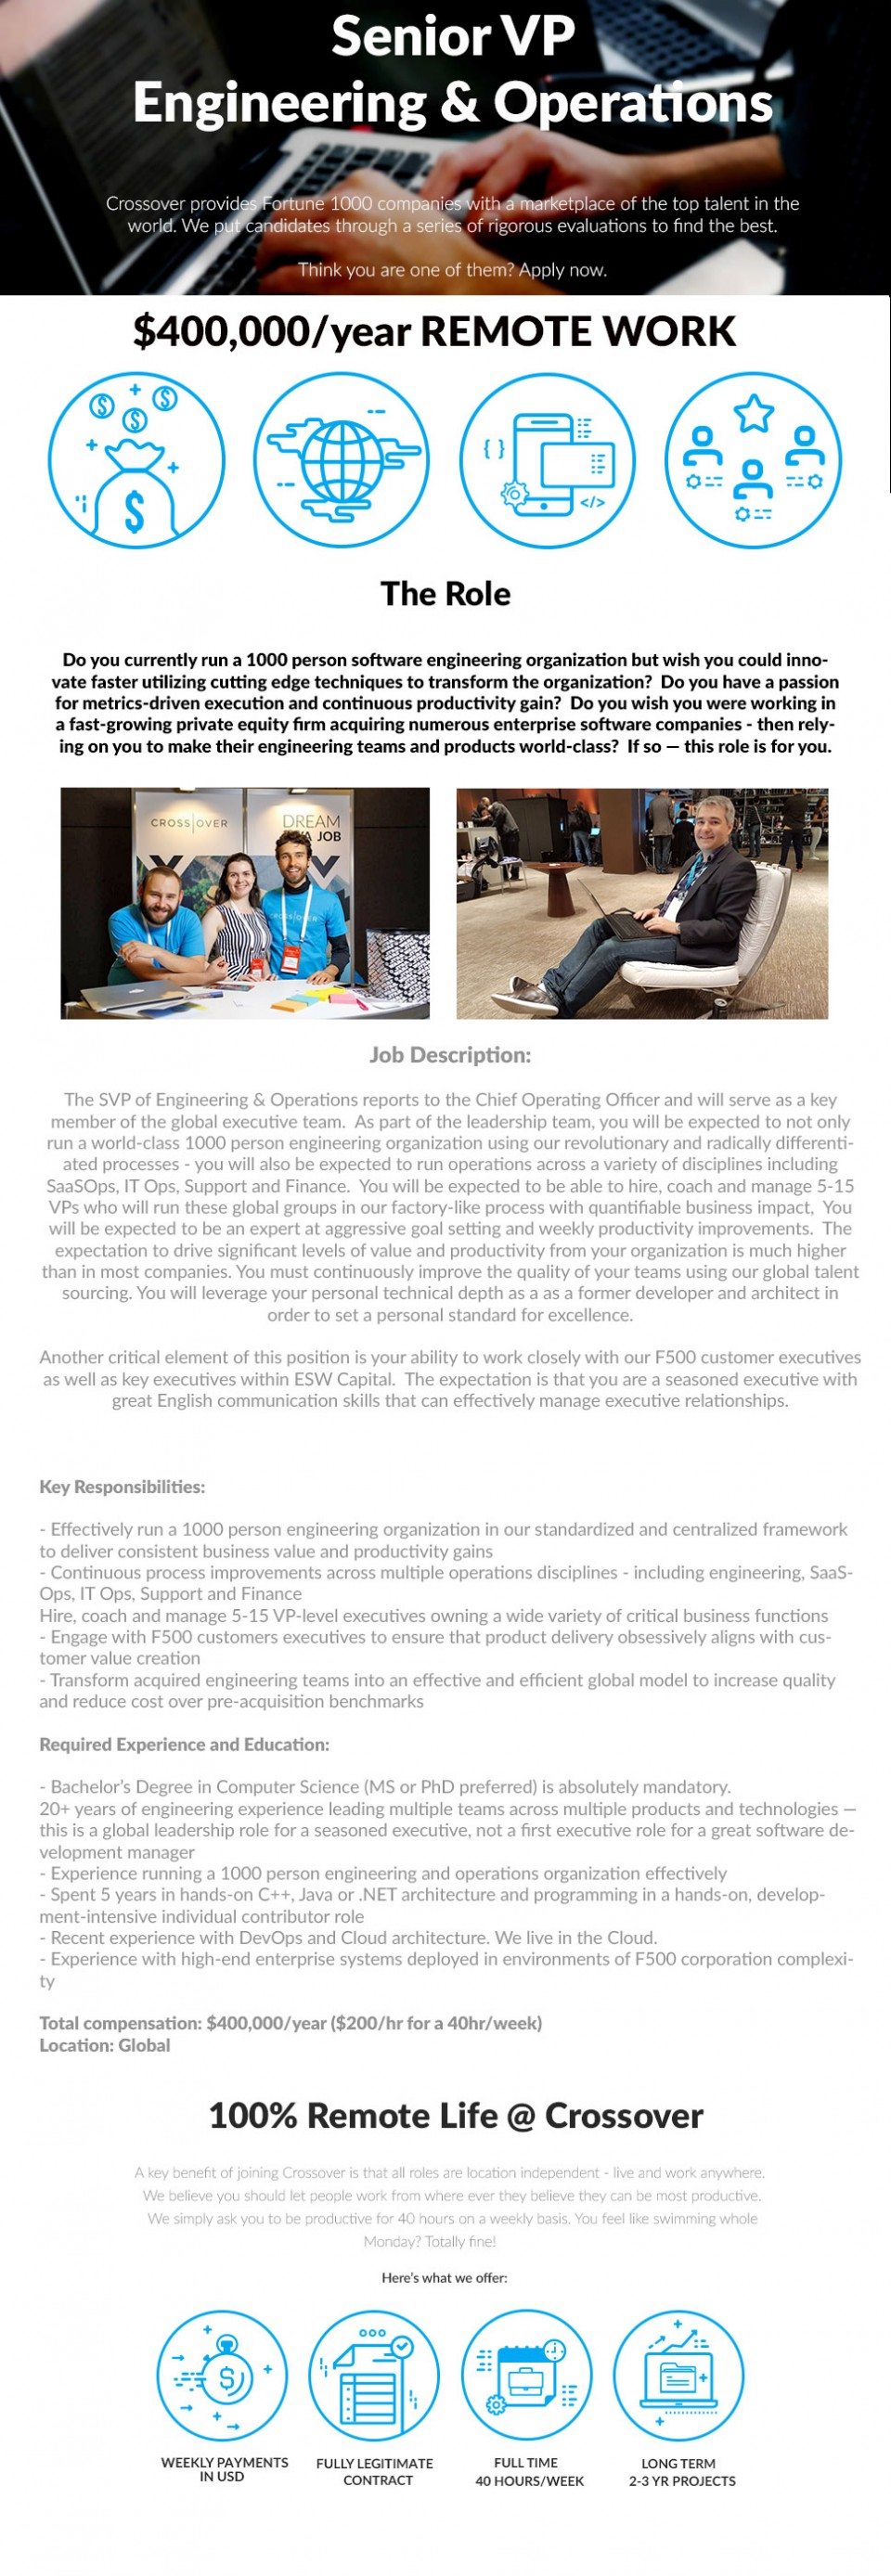 Senior VP of Engineering & Operations - $400,000/year